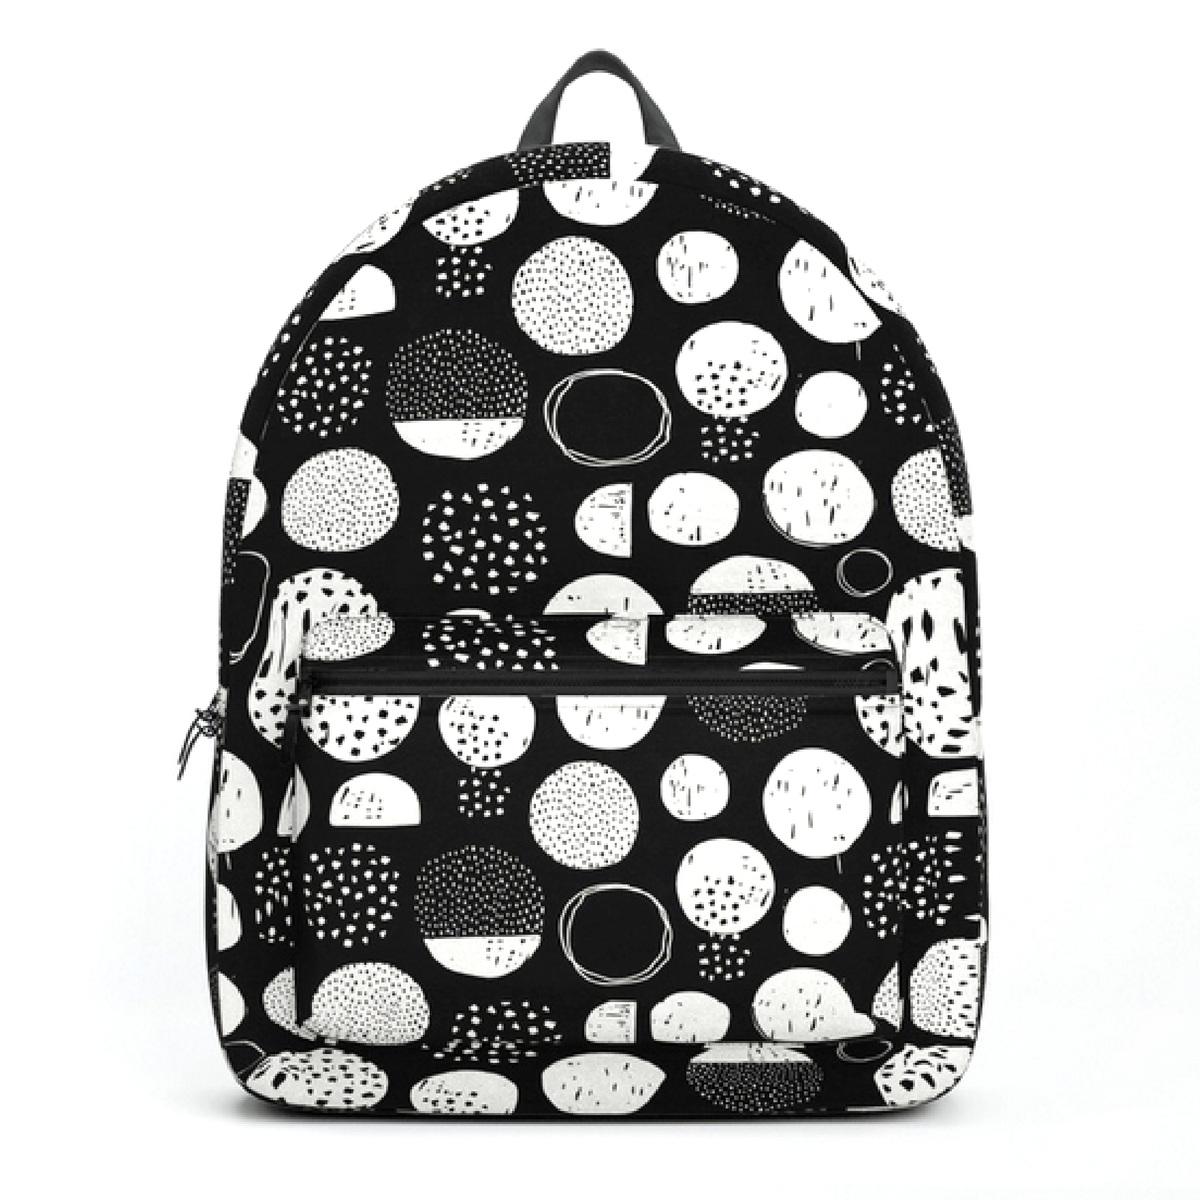 mfa -- designer textile - pois graphiques -- Society 6